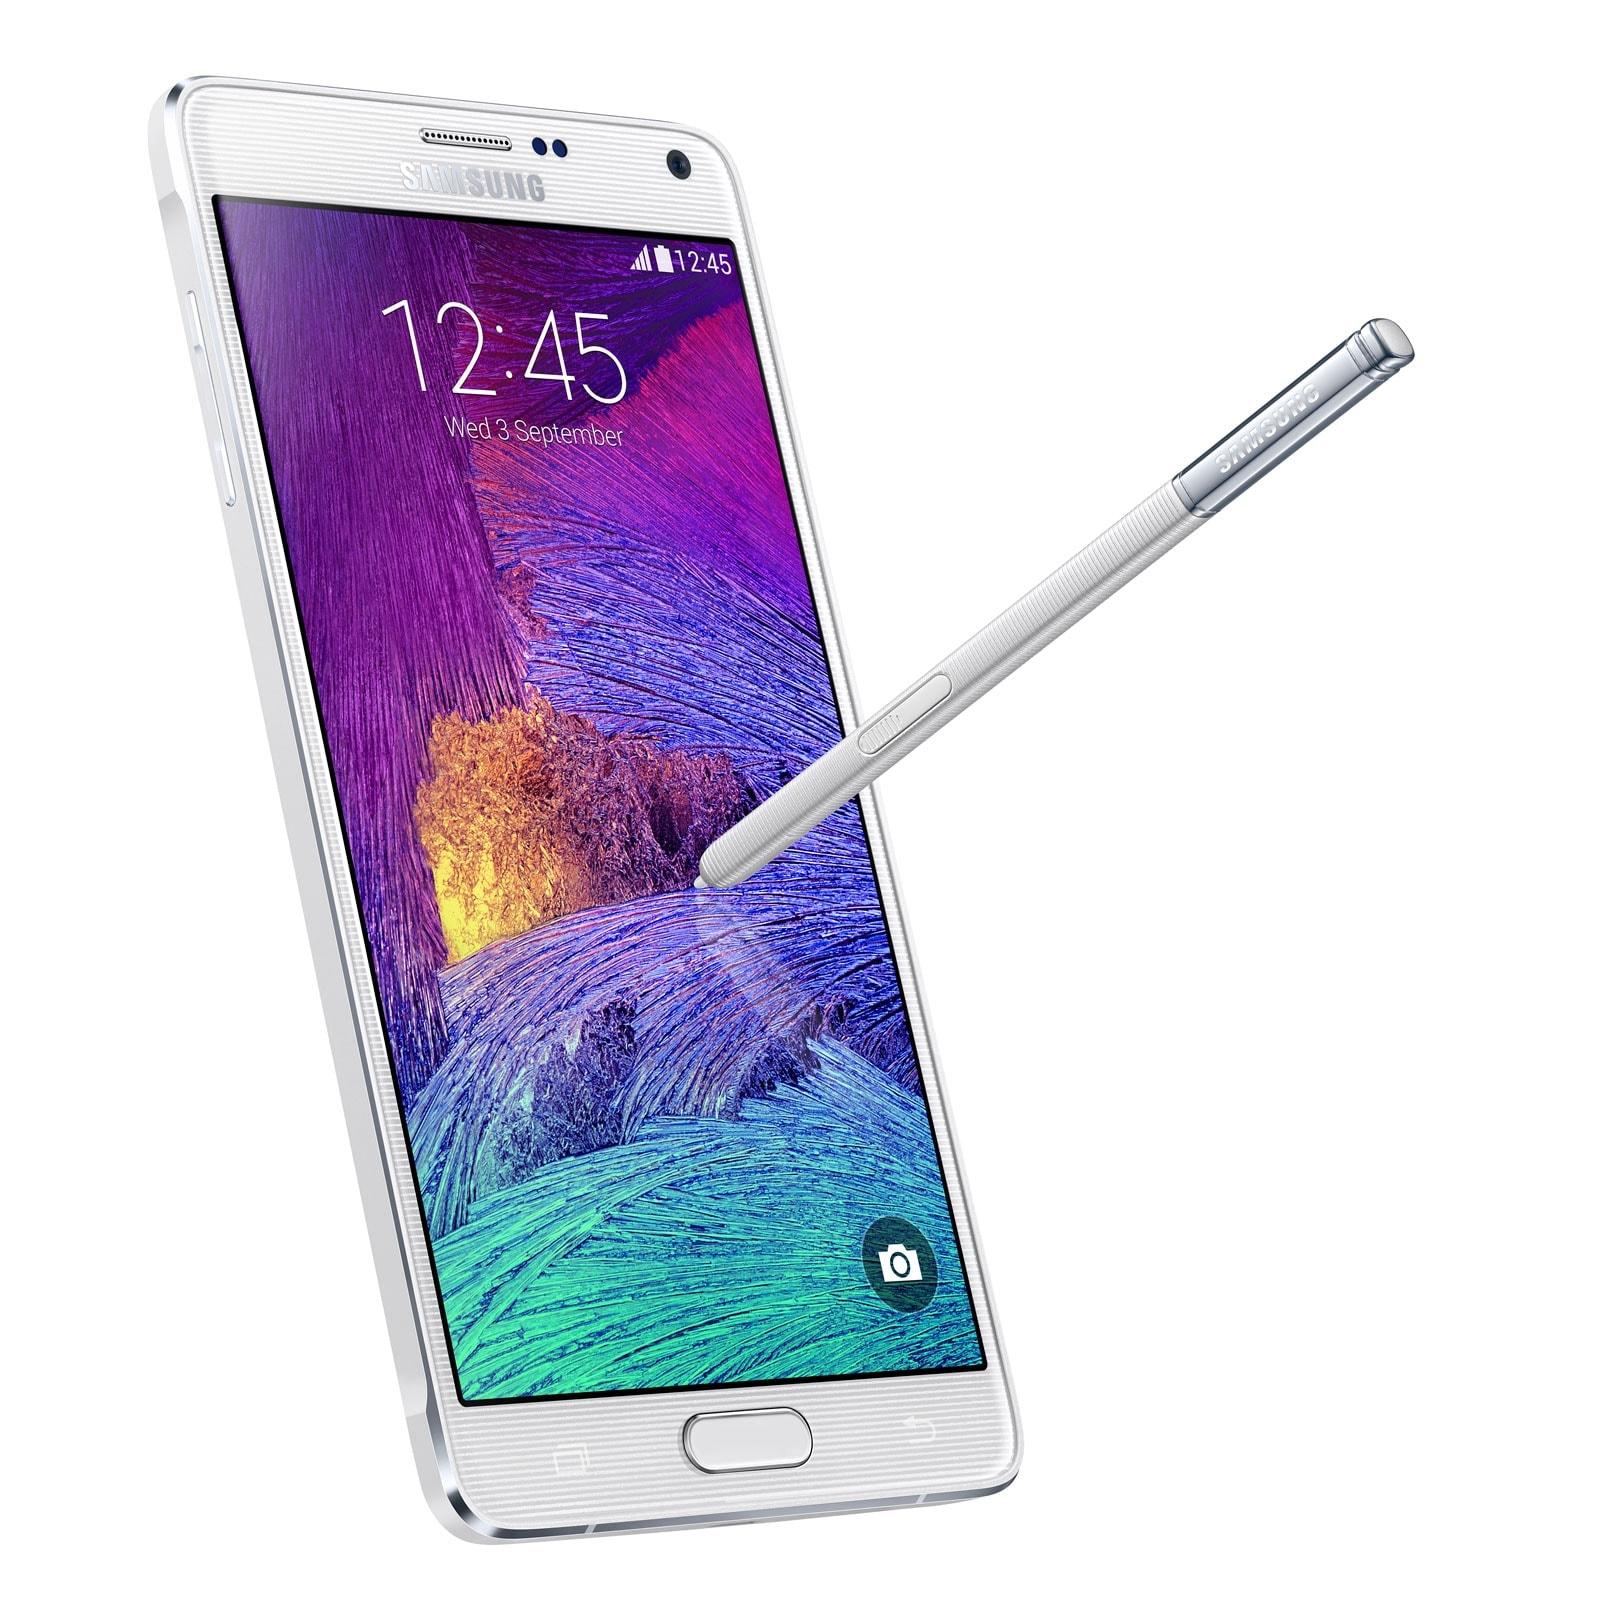 Samsung Galaxy Note 4 N910F 32Go White (SM-N910FZWEXEF) - Achat / Vente Téléphonie sur Cybertek.fr - 1